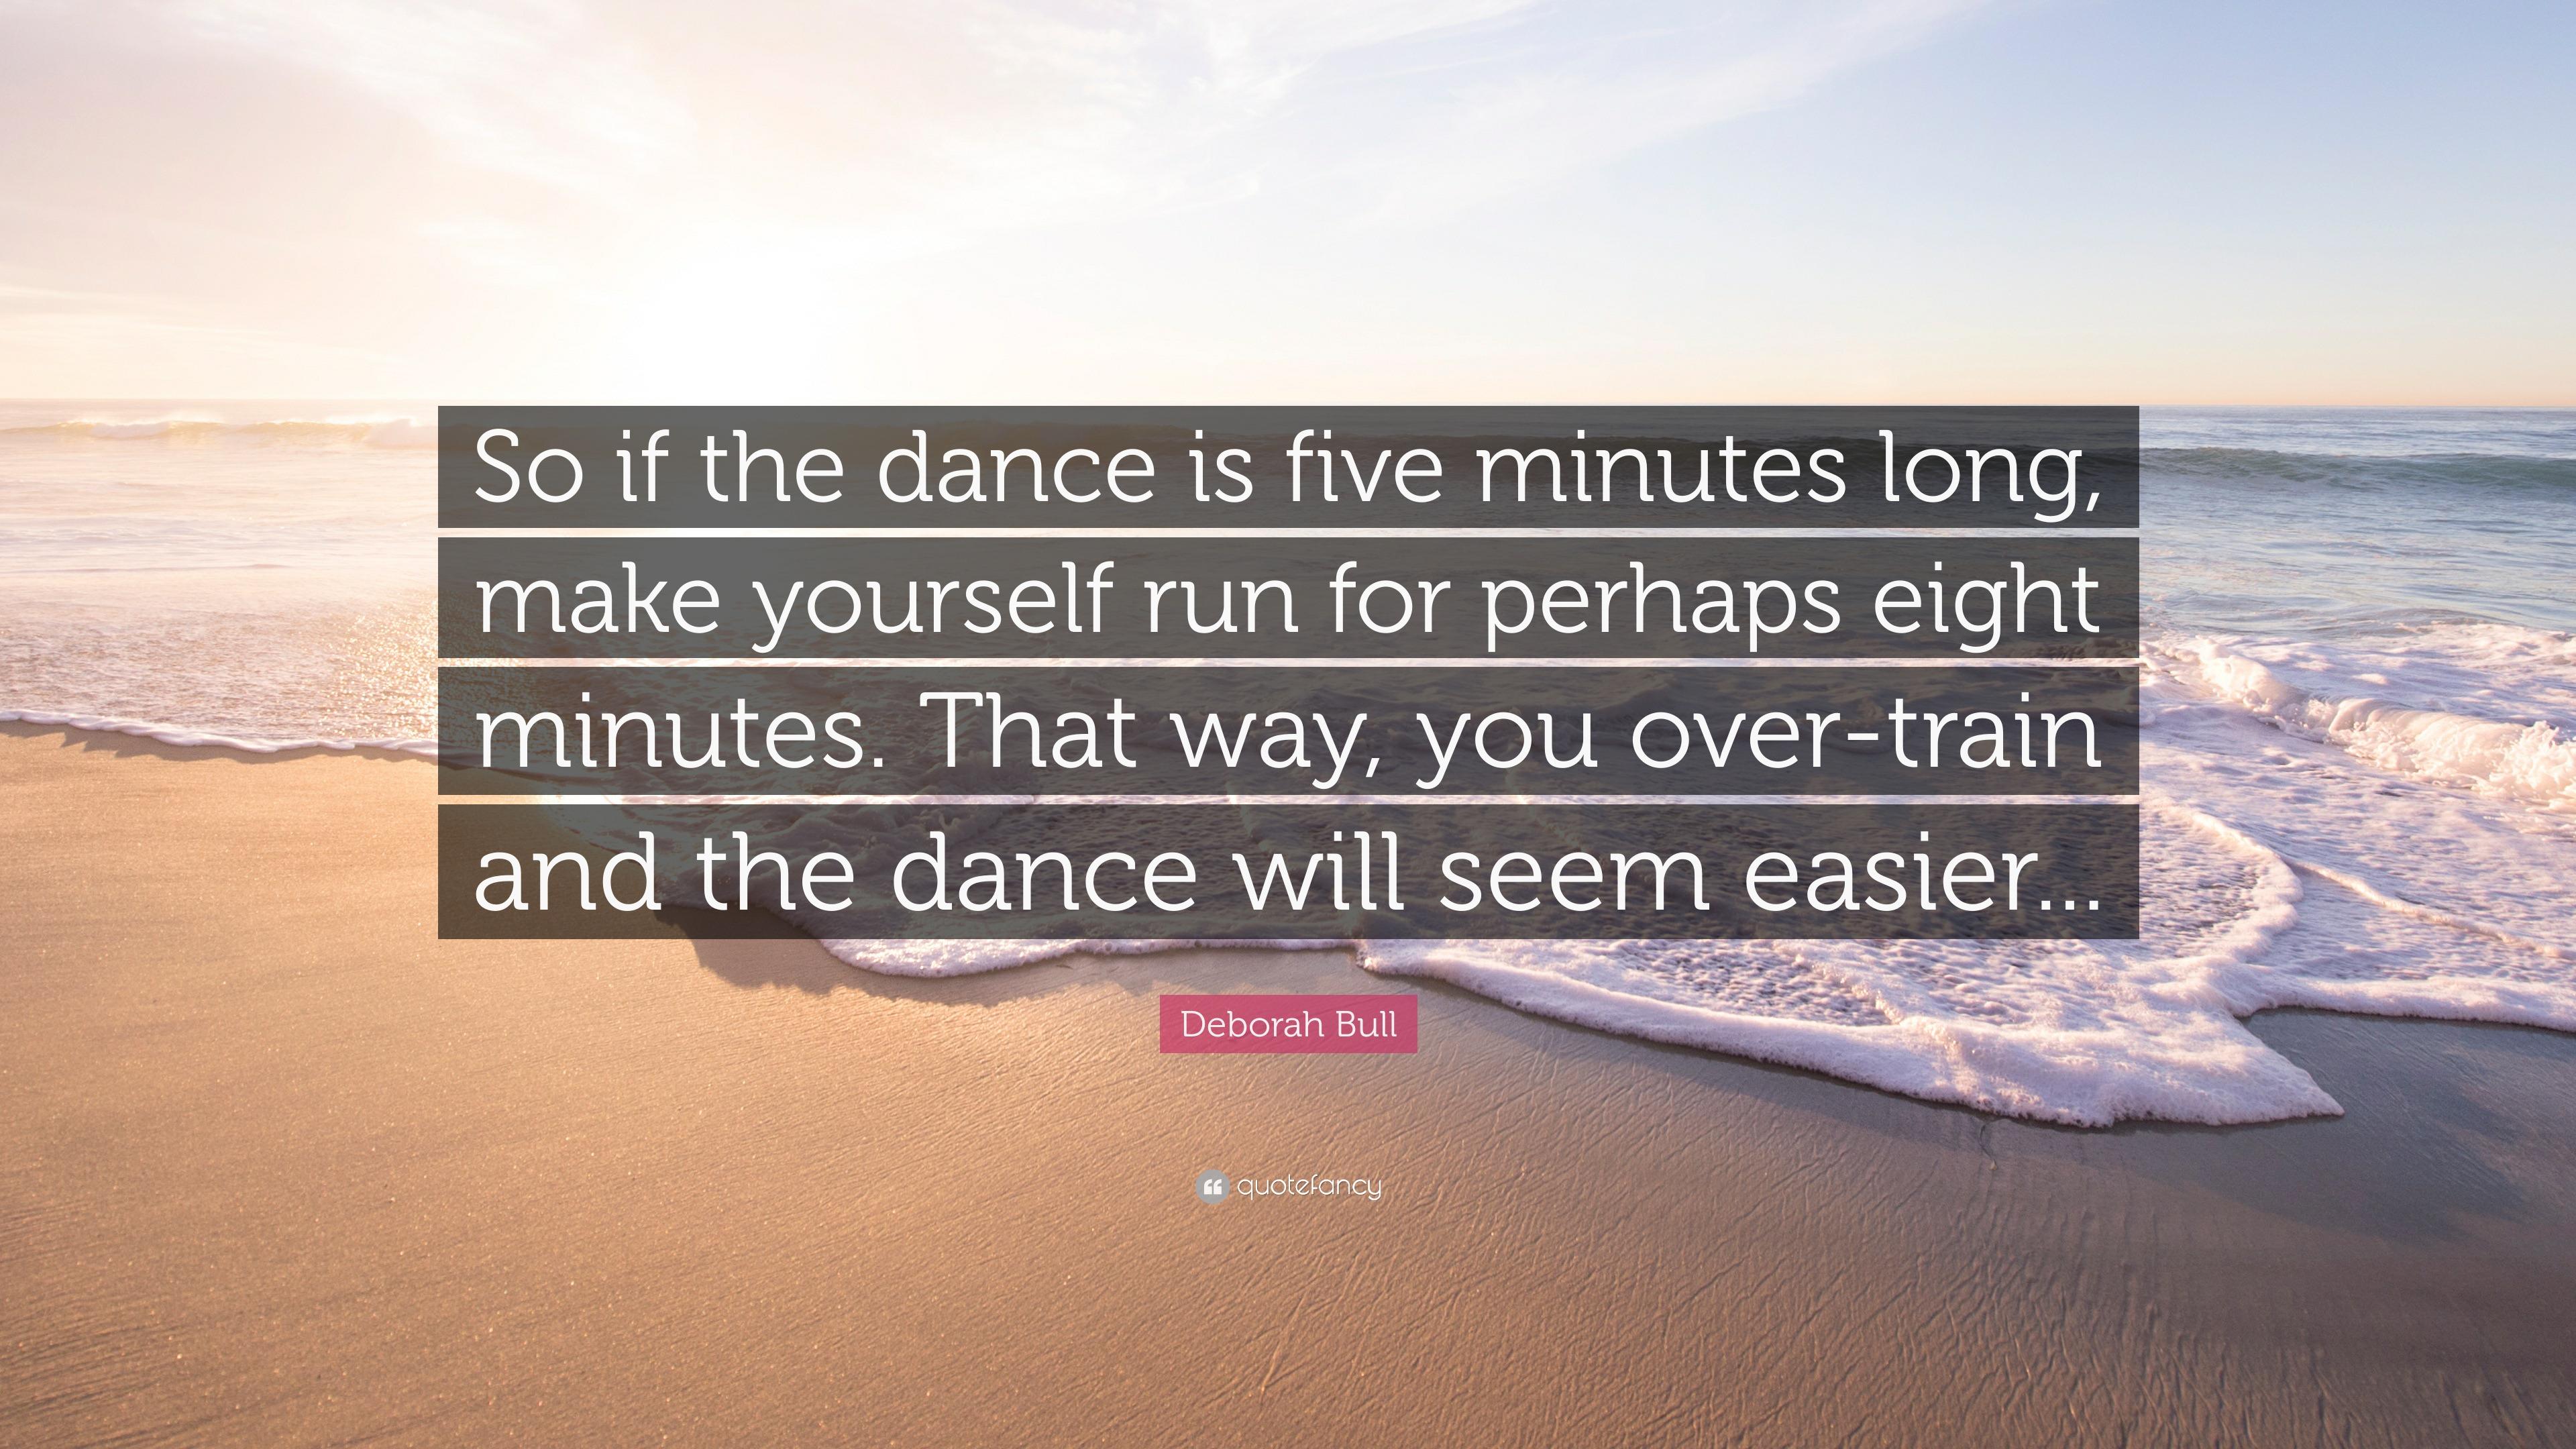 Make yourself last longer